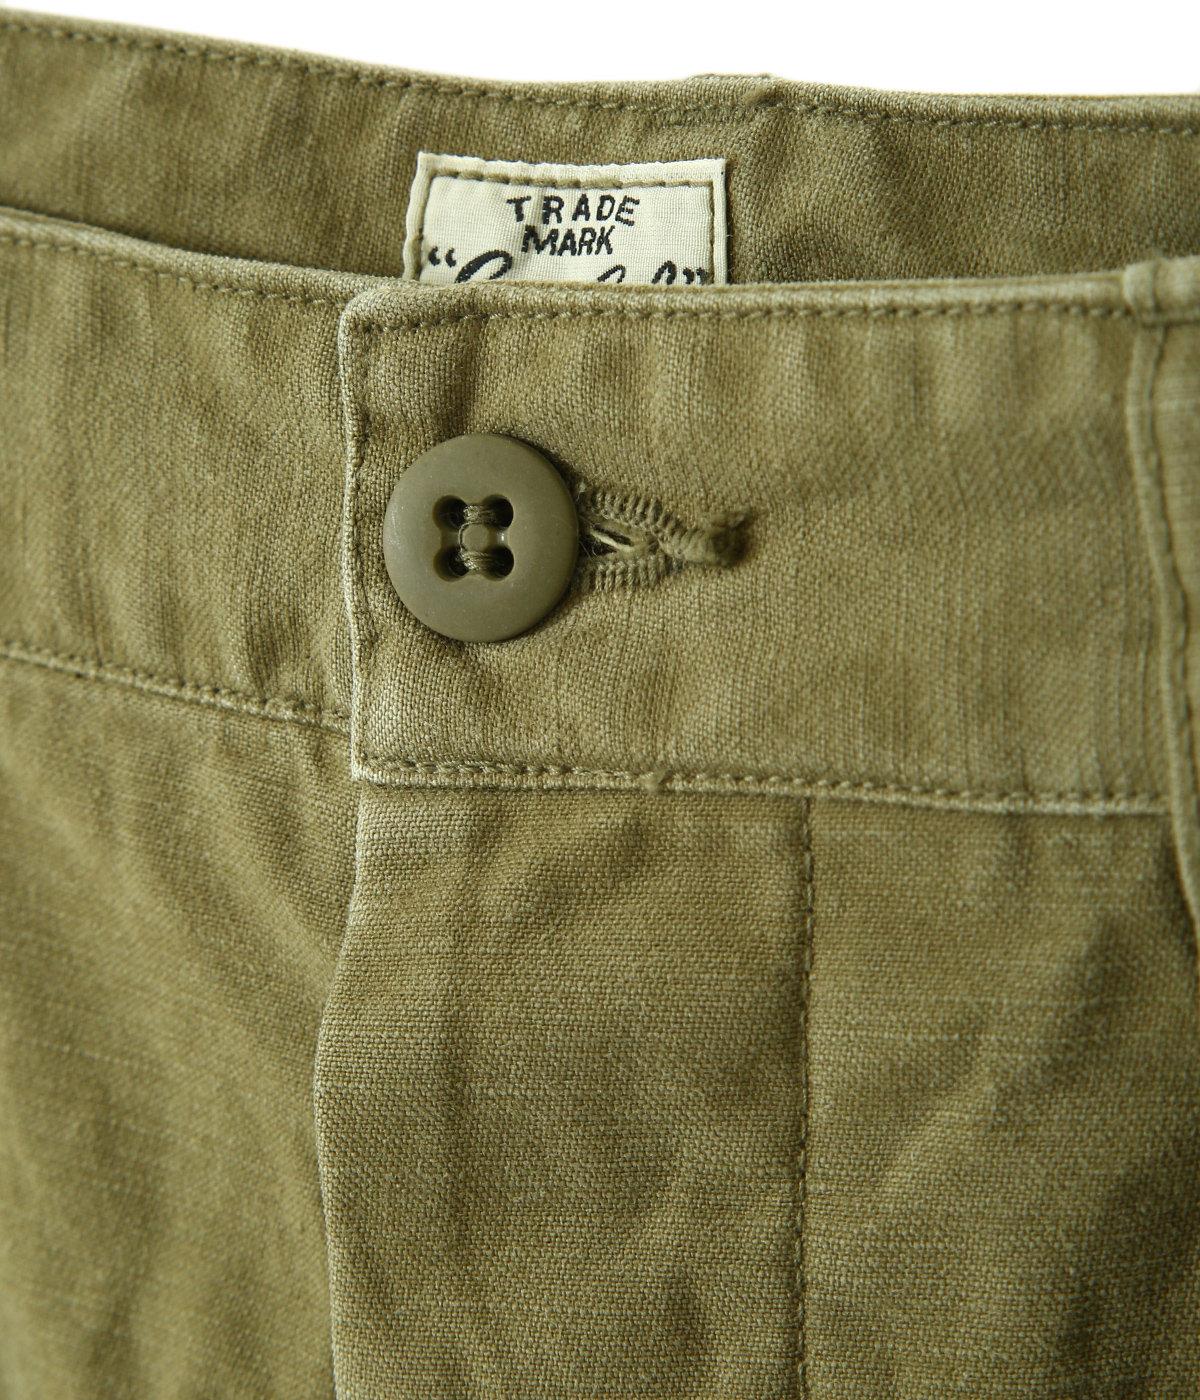 HEAVY BACKSATIN U.S.A.F. UTILITY PANTS